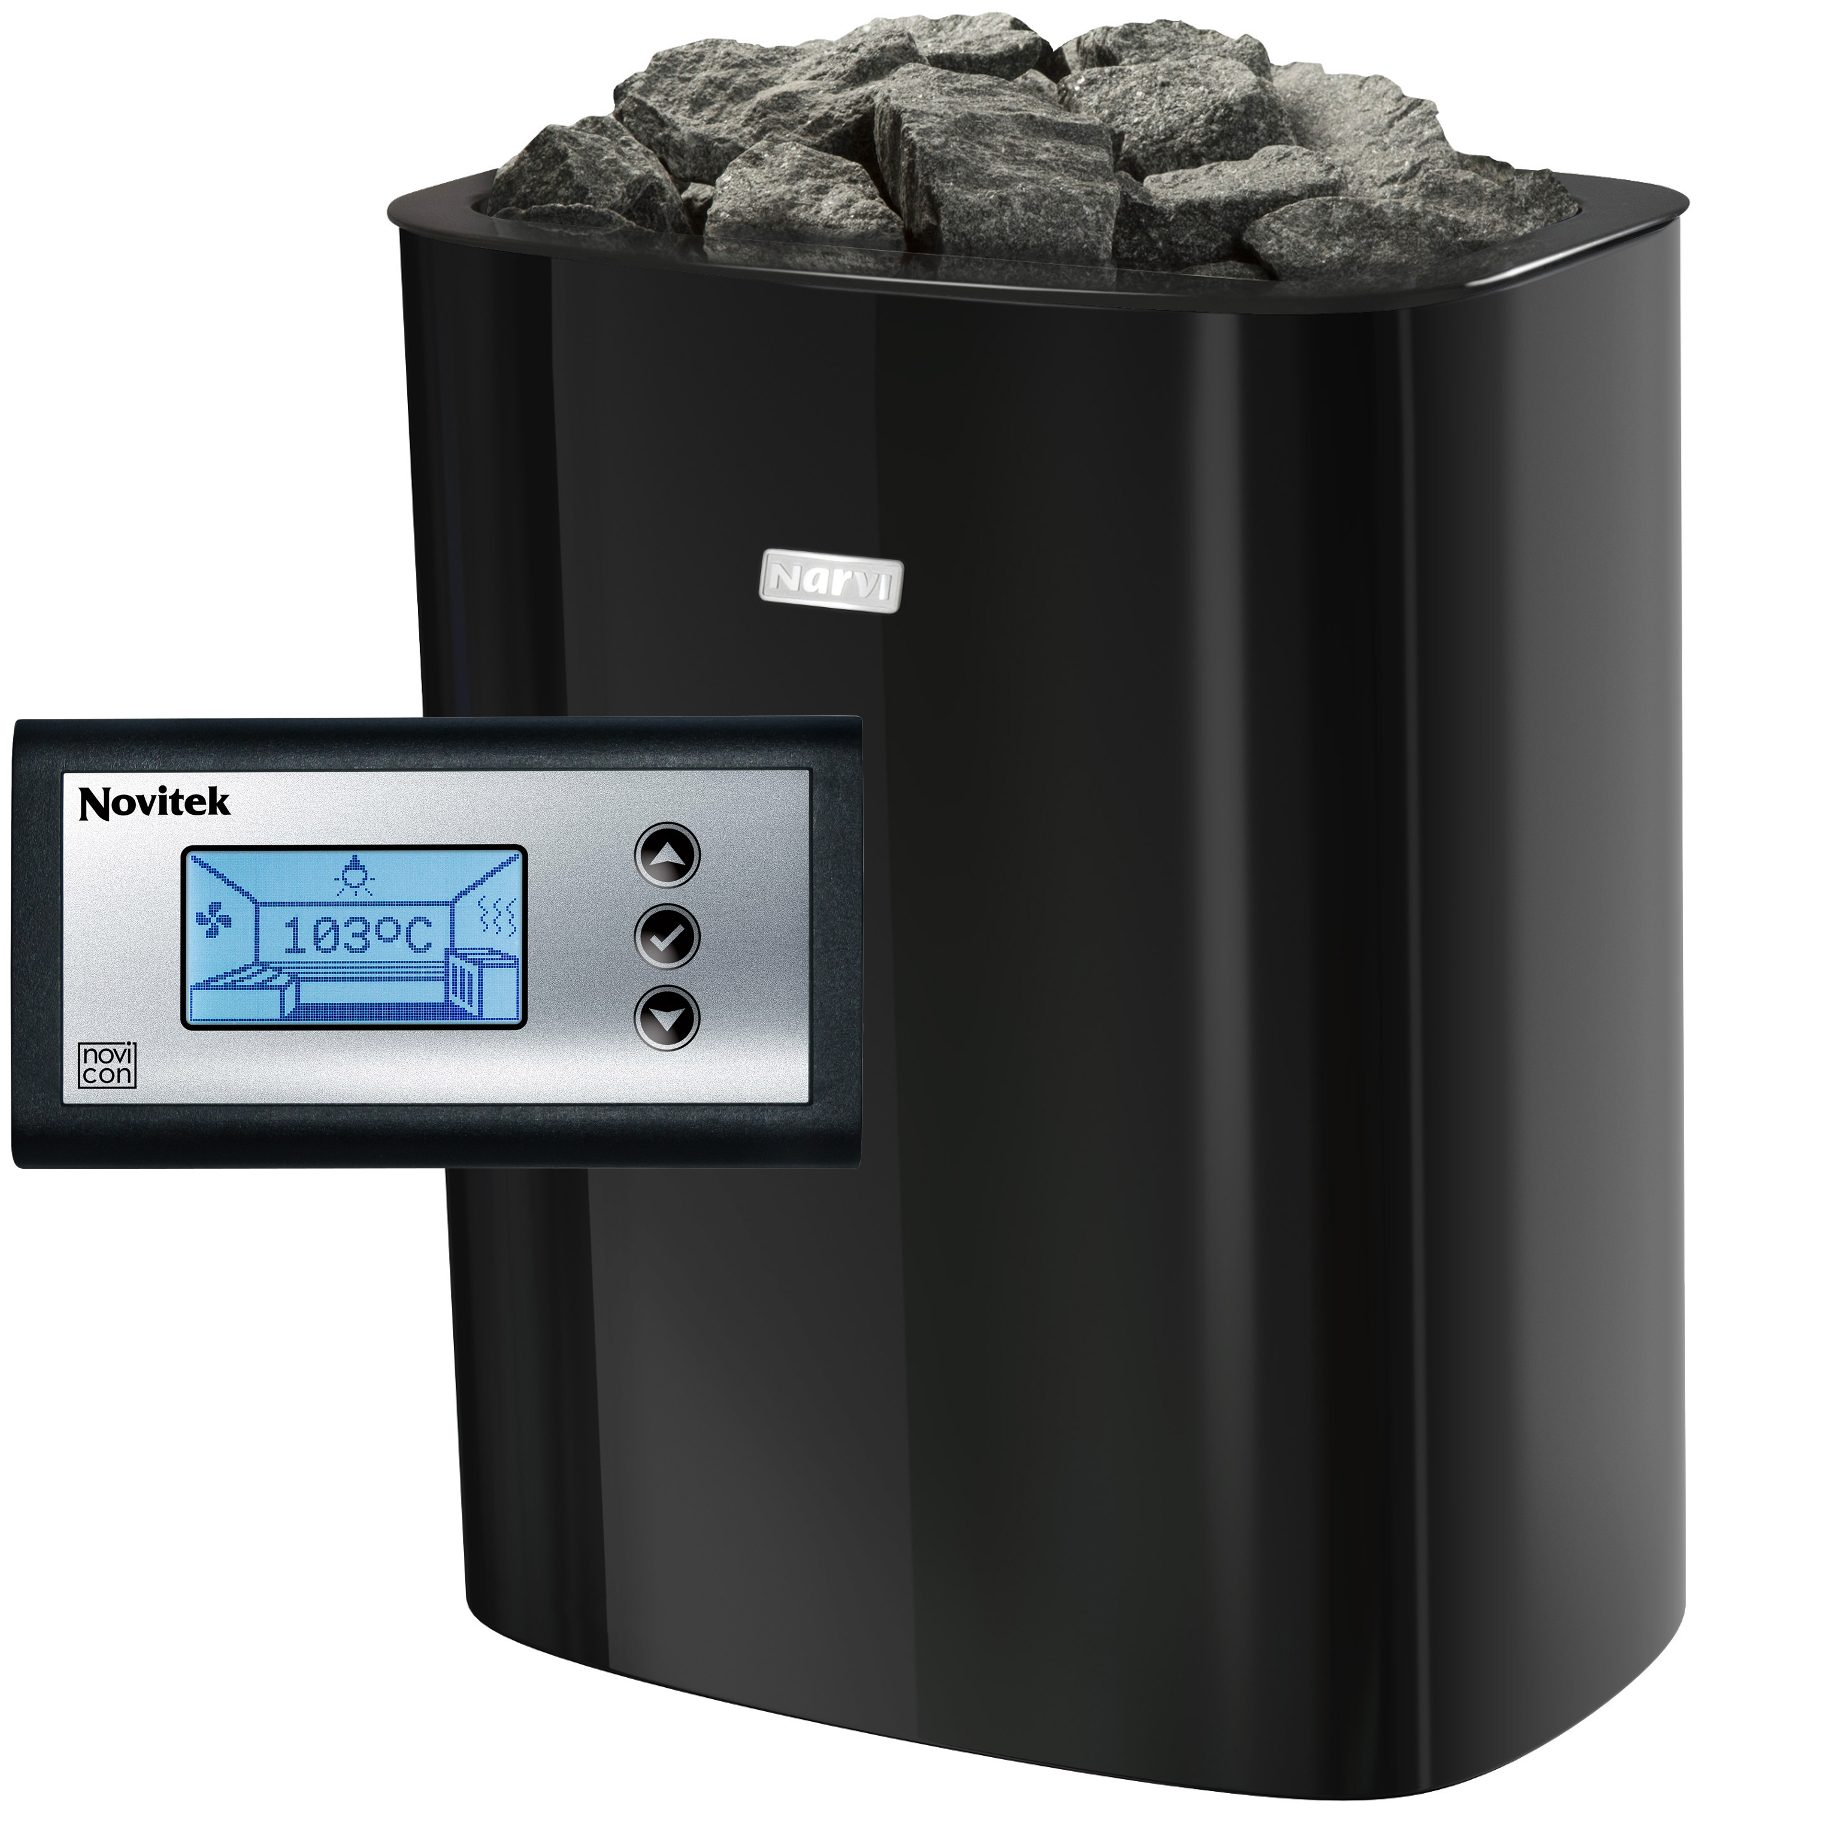 Sauna pečená pre saunu NIVI NC 6 kW C s ovládaním